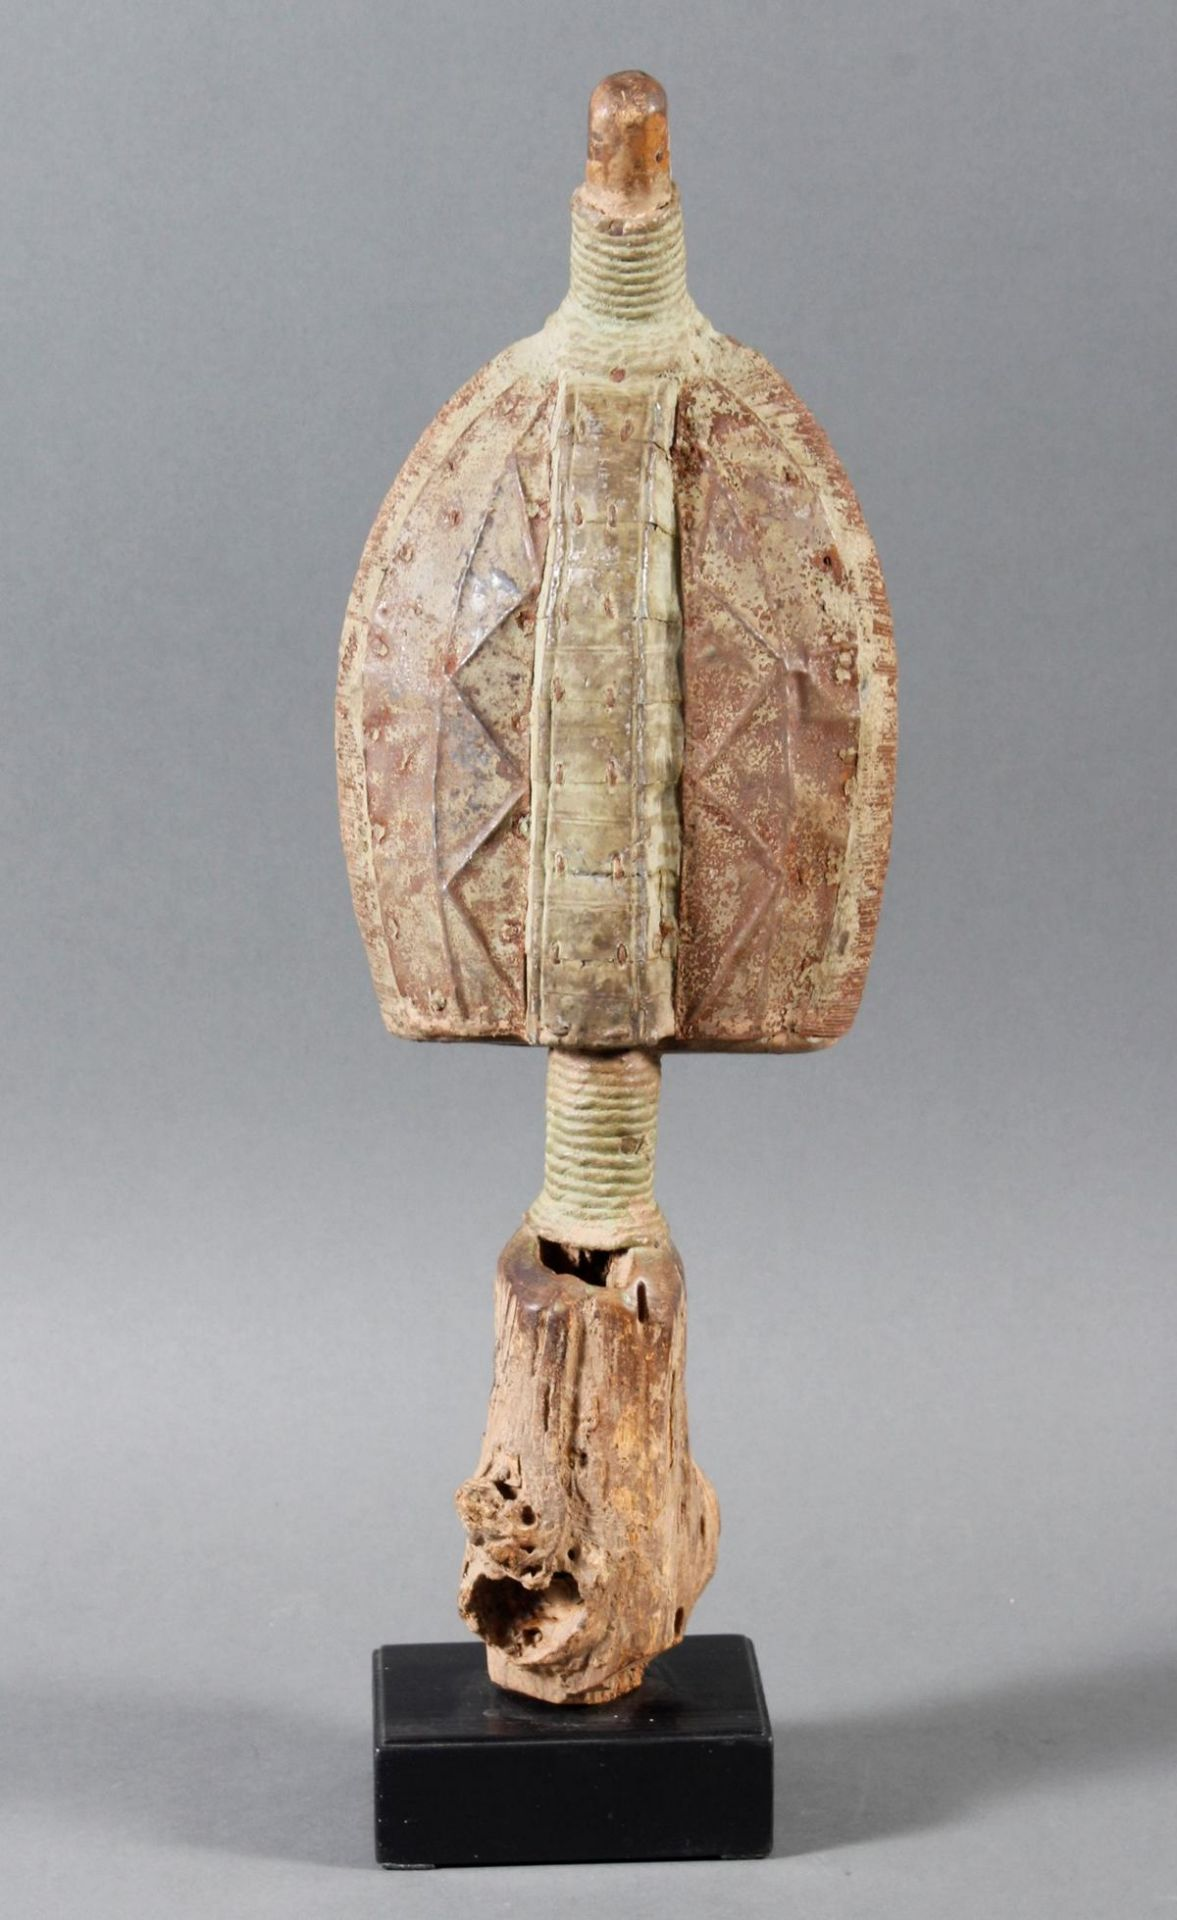 Grabwächter, Reliquiarfigur, Mahongwe / Gabun - Bild 5 aus 7